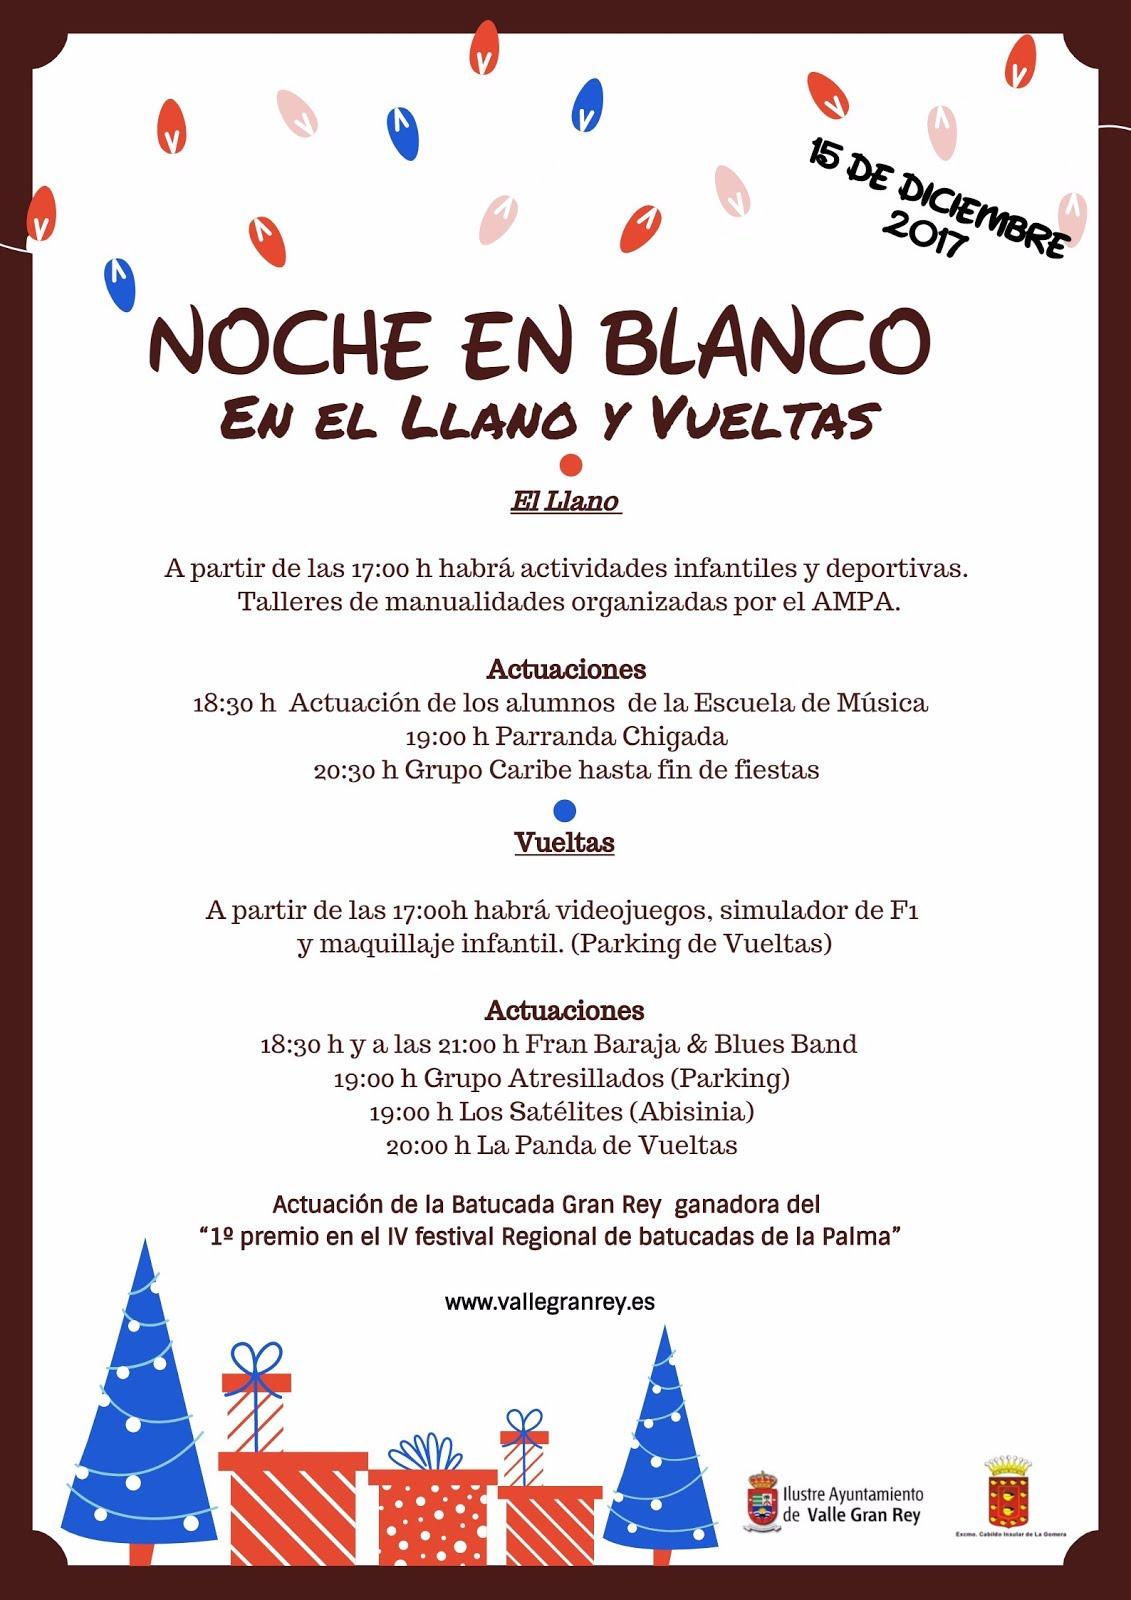 LA GOMERA ISLAND (Canary Islands): It\'s \'white night\' time again